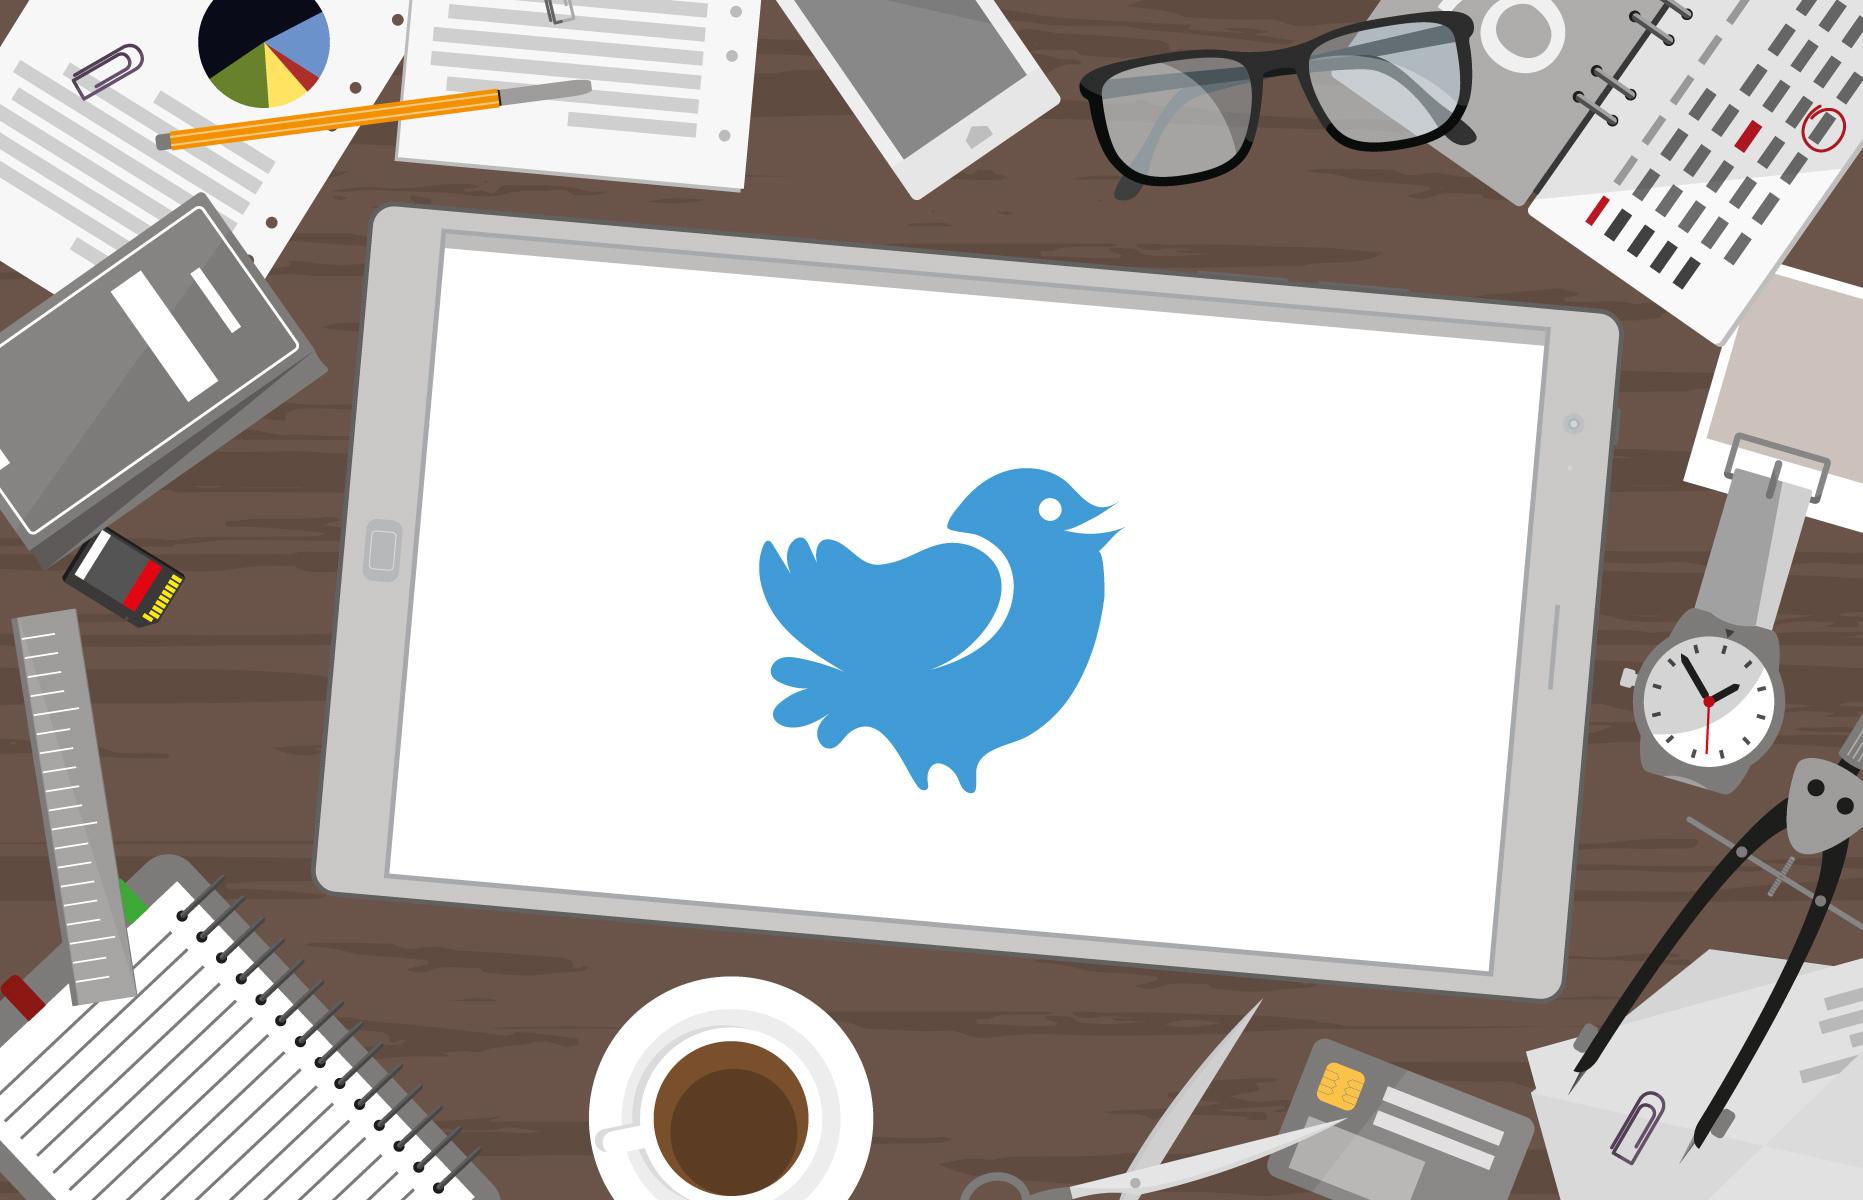 Twitterのイメージ